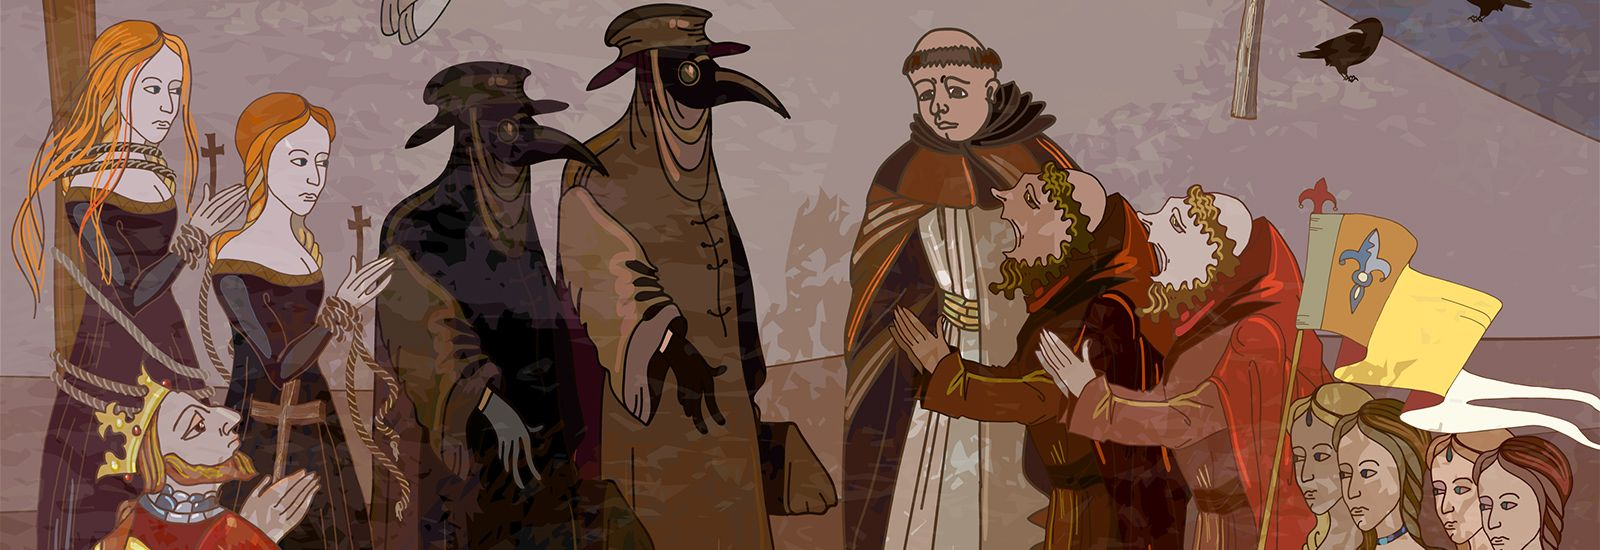 Illustration of the Black Death